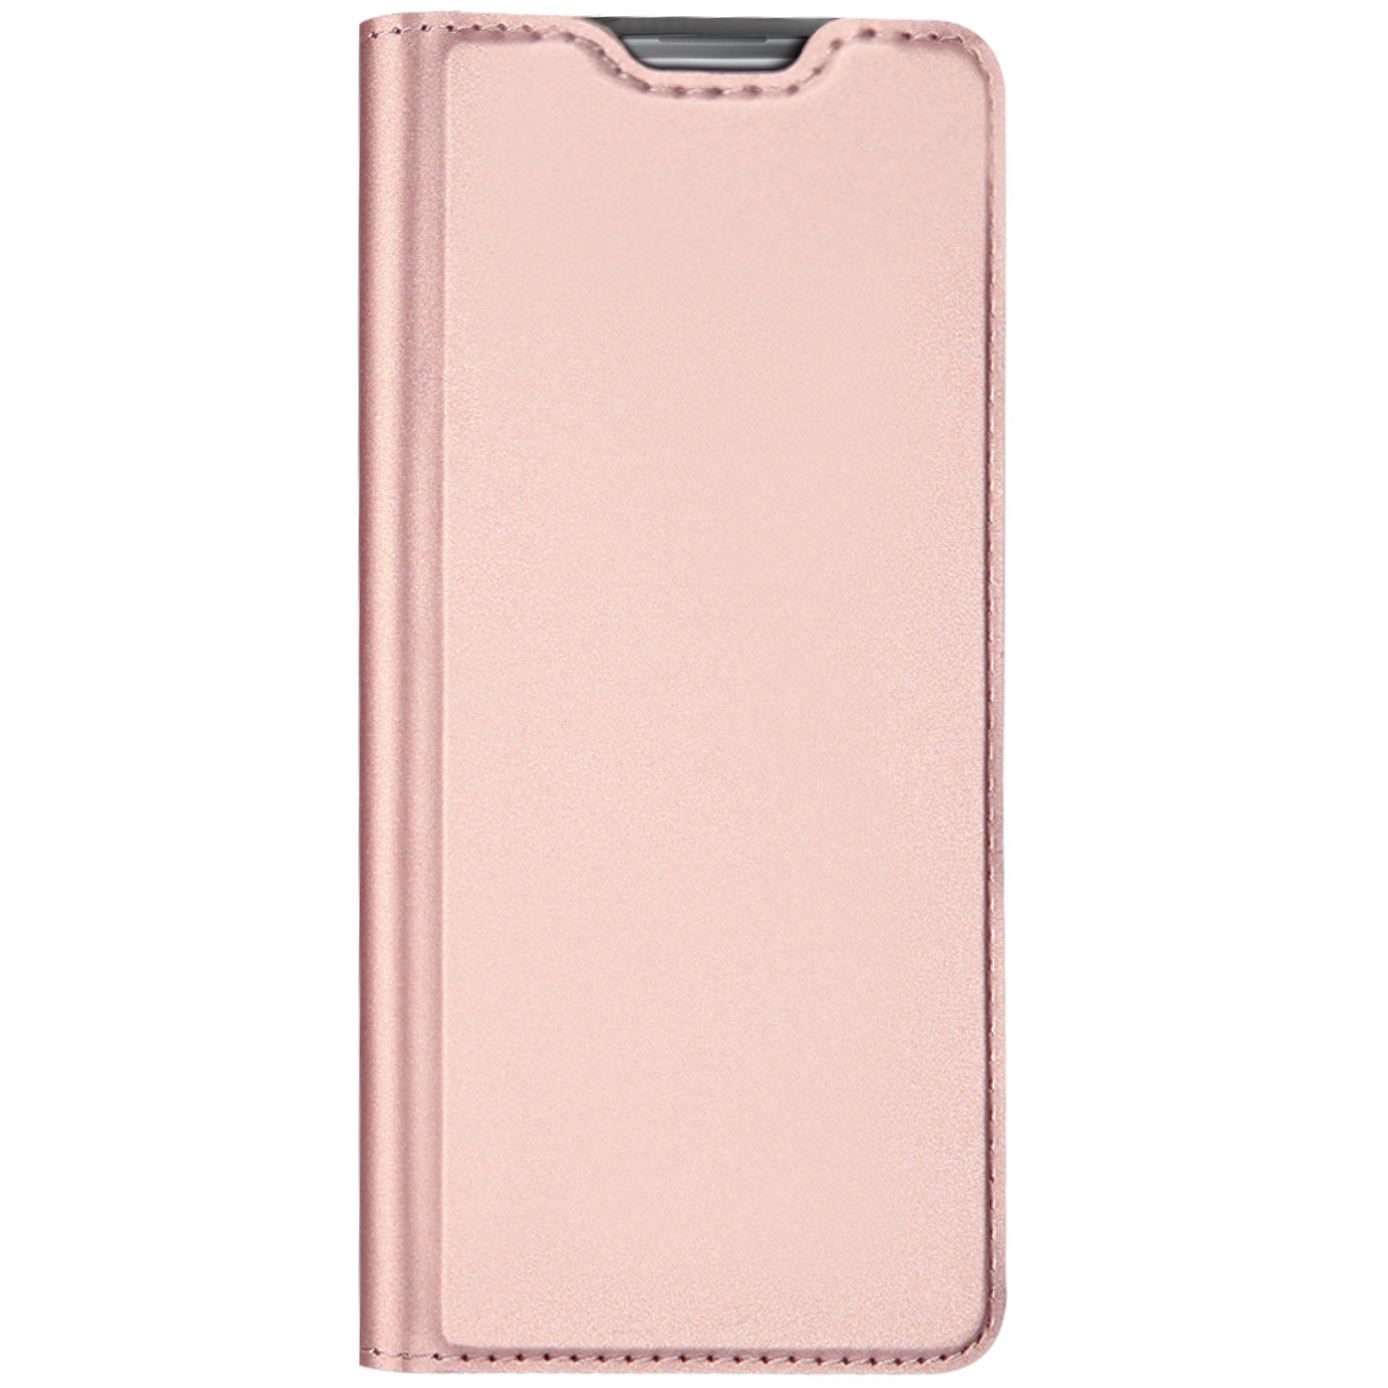 Dux Ducis Slim Softcase Booktype Samsung Galaxy Note 10 Lite